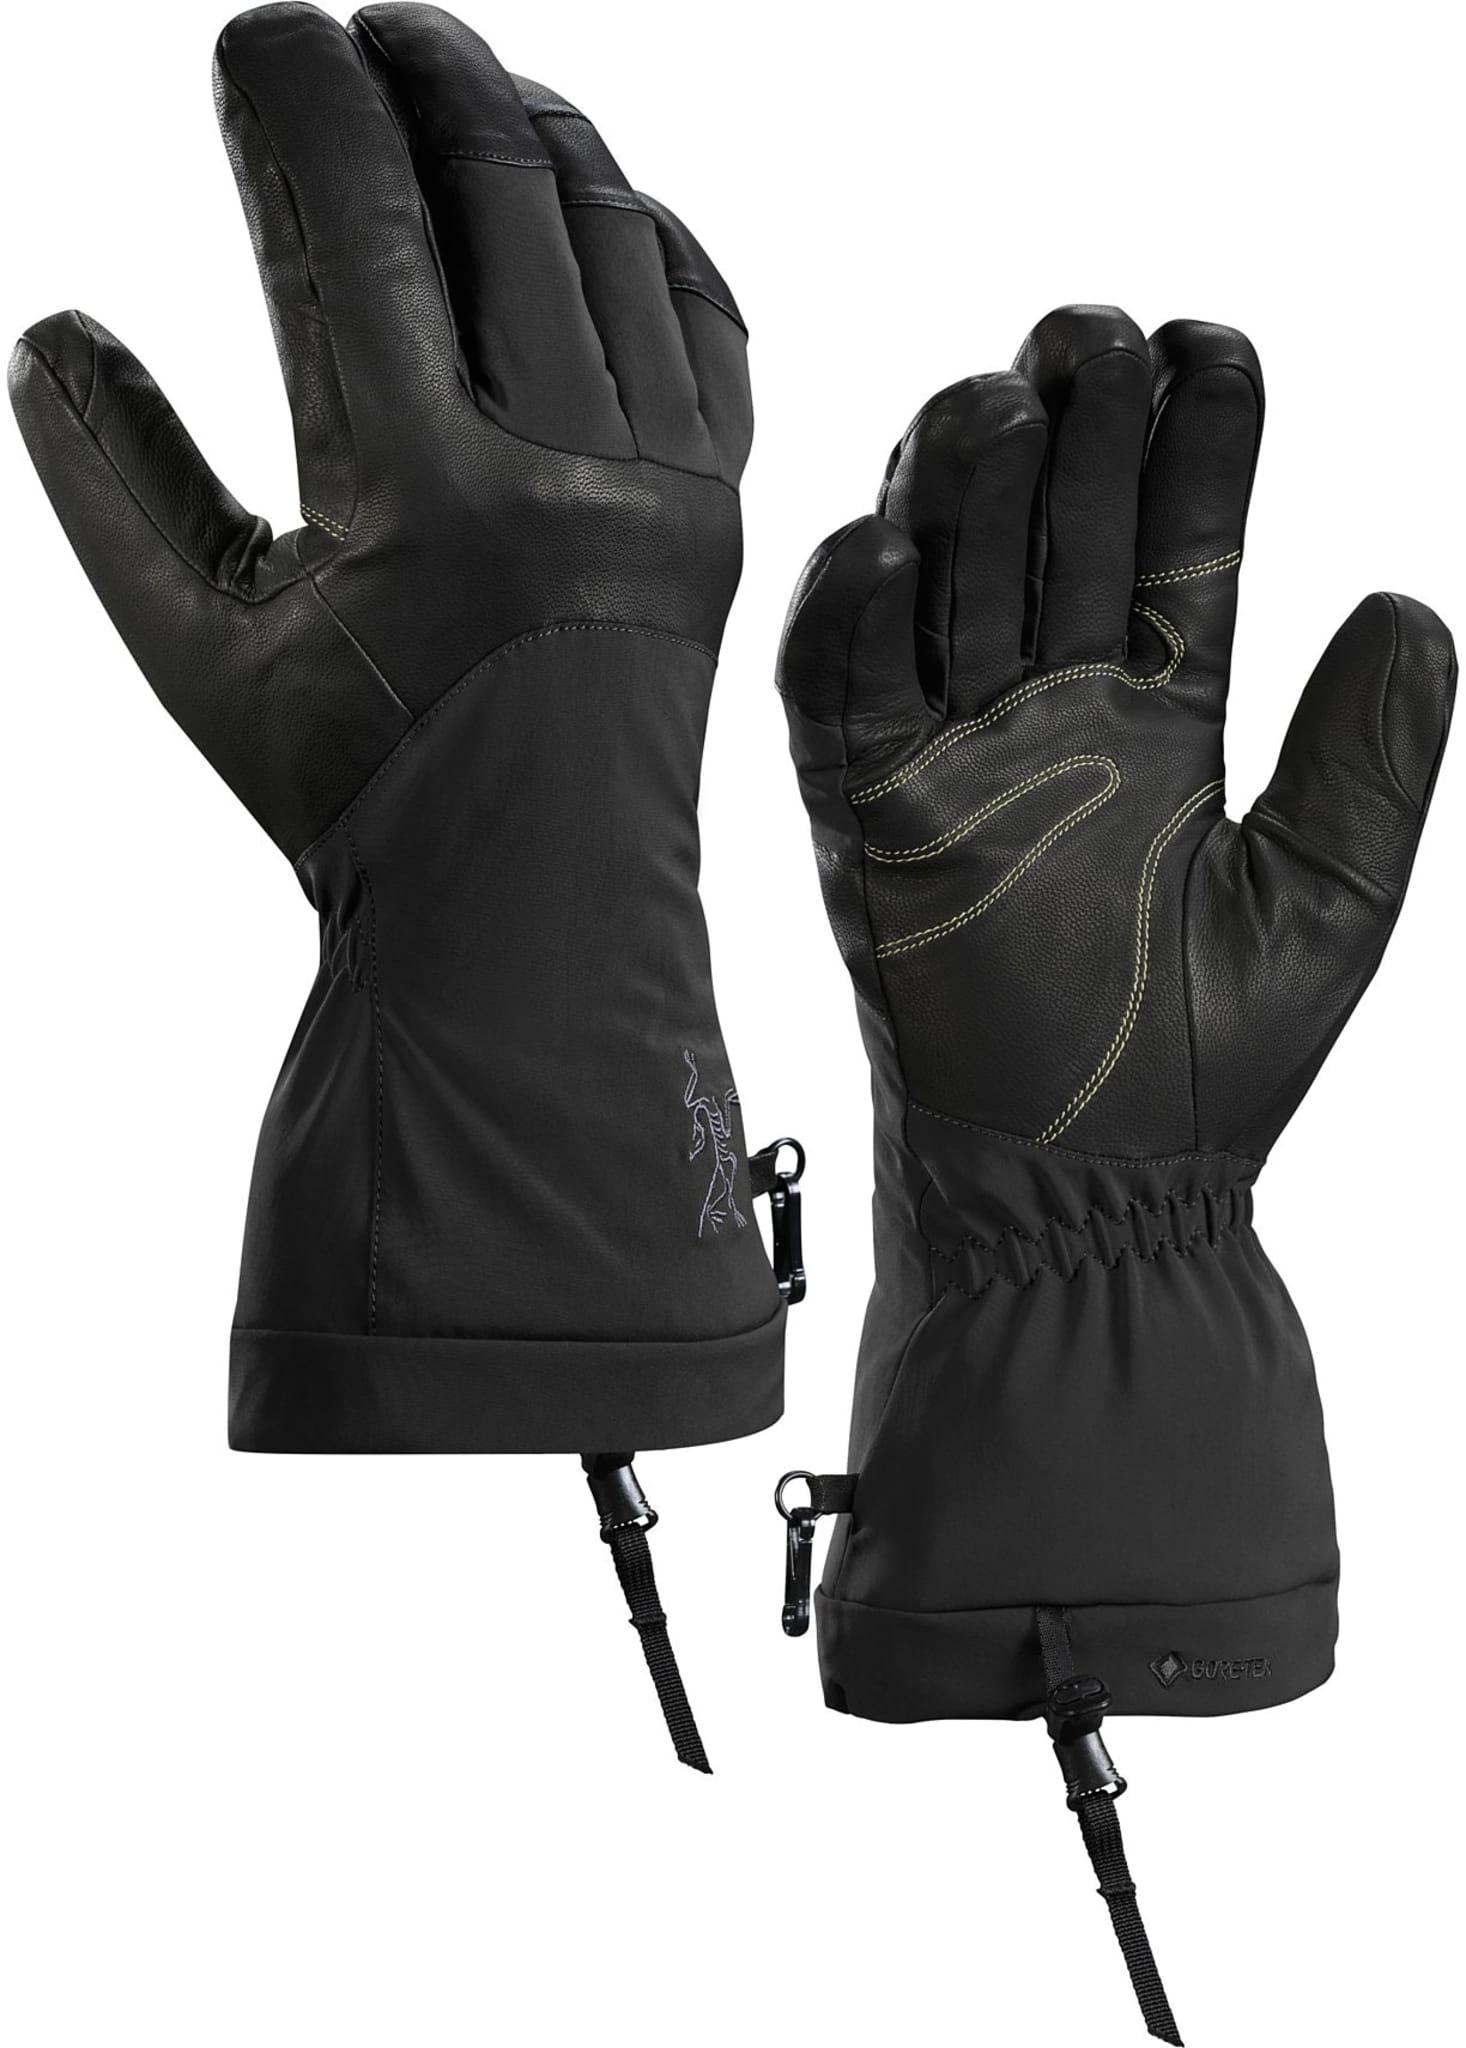 Allsidige hansker for vintersport med GORE-TEX, Primaloft og lær